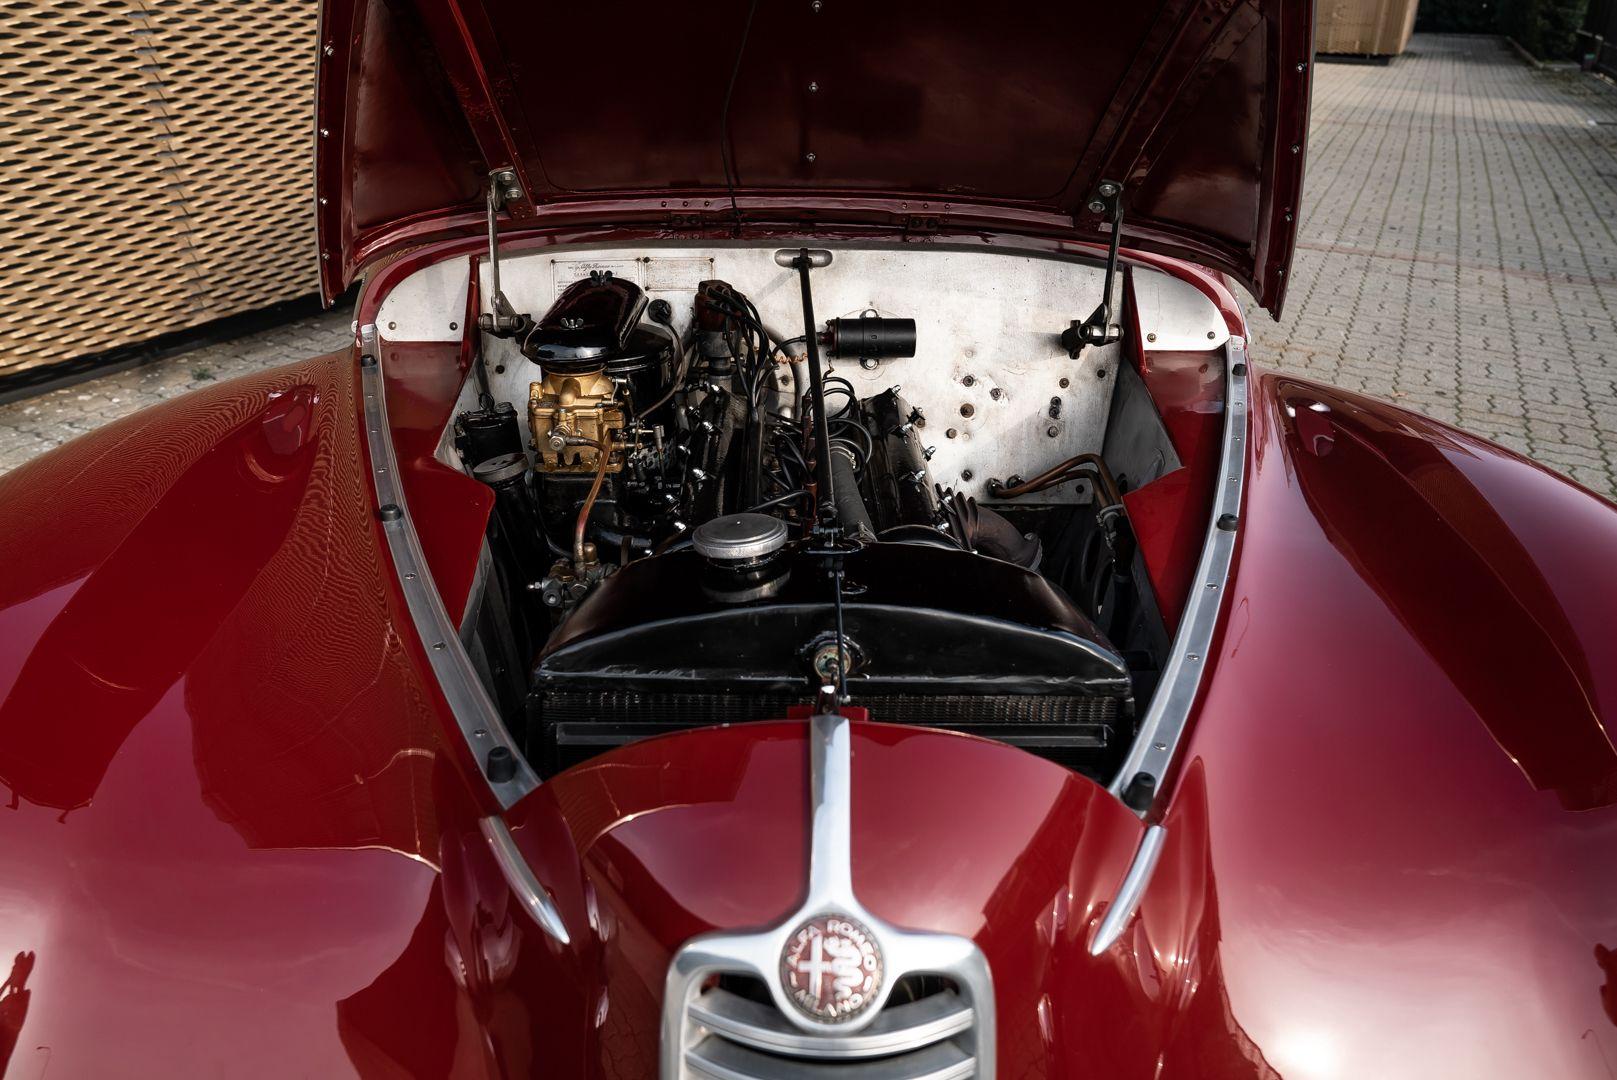 1947 Alfa Romeo Freccia d'oro 6C 2500 Sport 61715